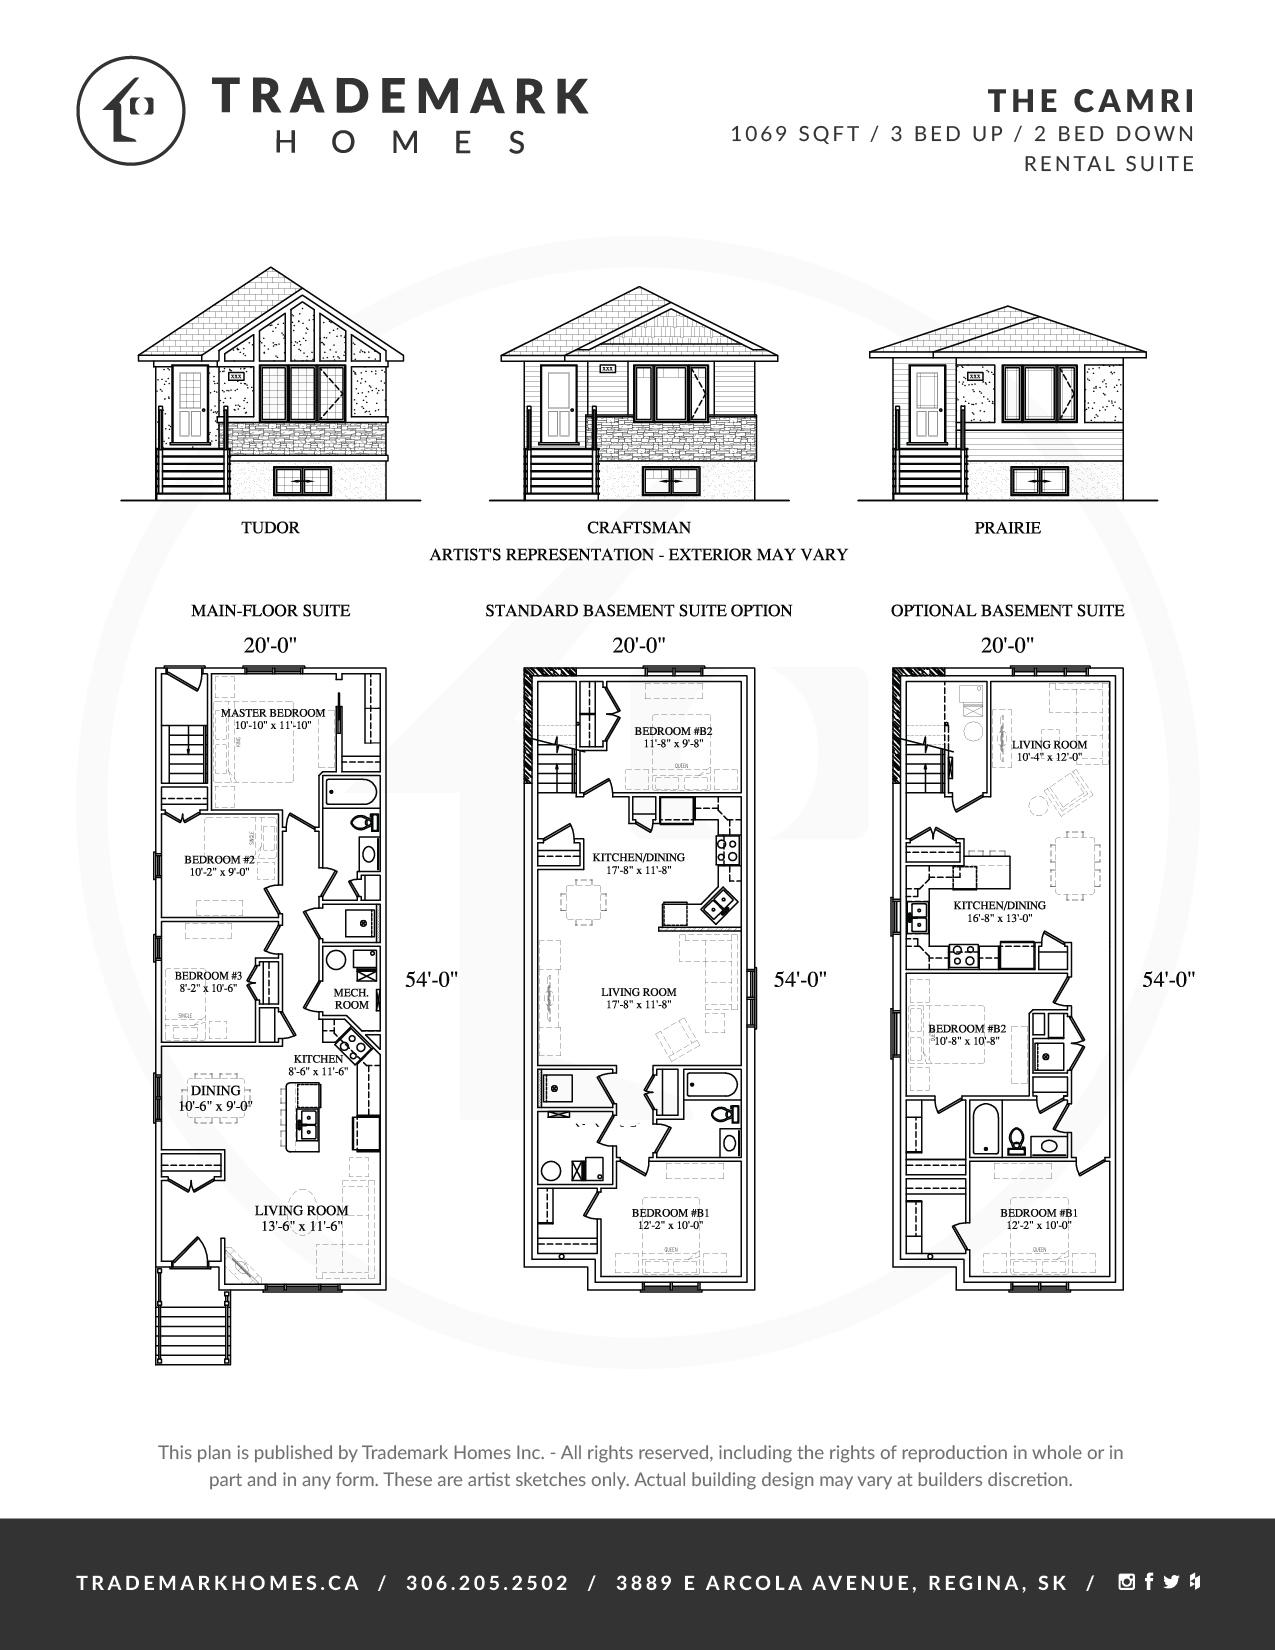 Trademark Homes The Camri Lane Lot